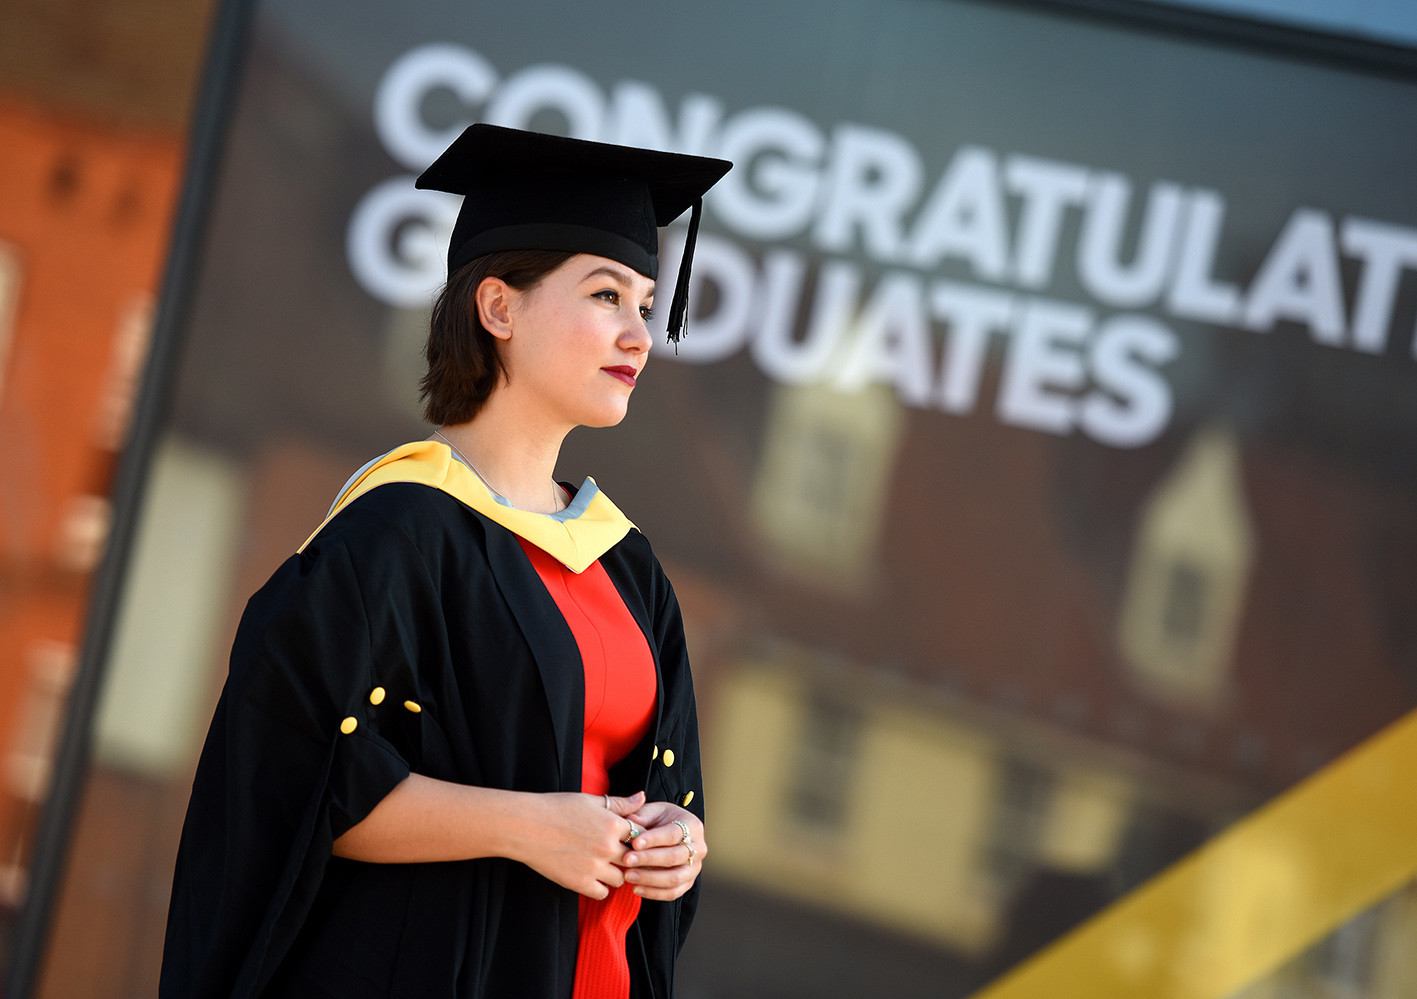 University of Suffolk graduation